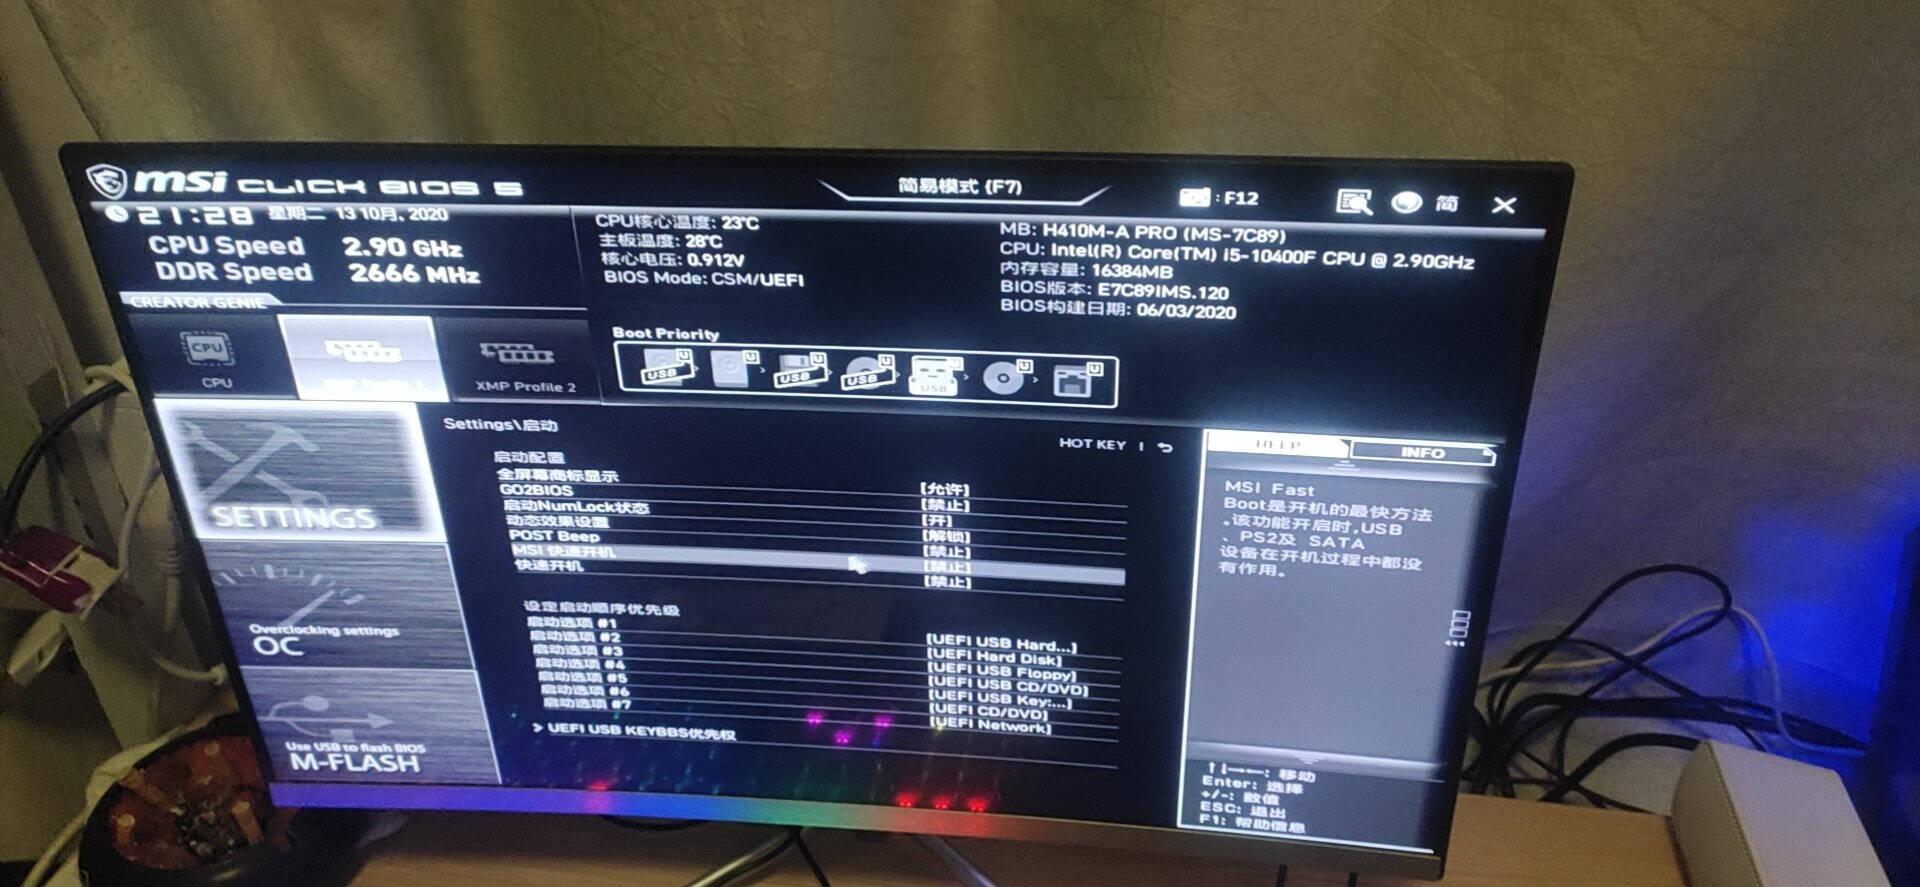 微星MSIH410M-APRO电脑主板10400/10400F/10500/10700(INTELH410/LGA1200)